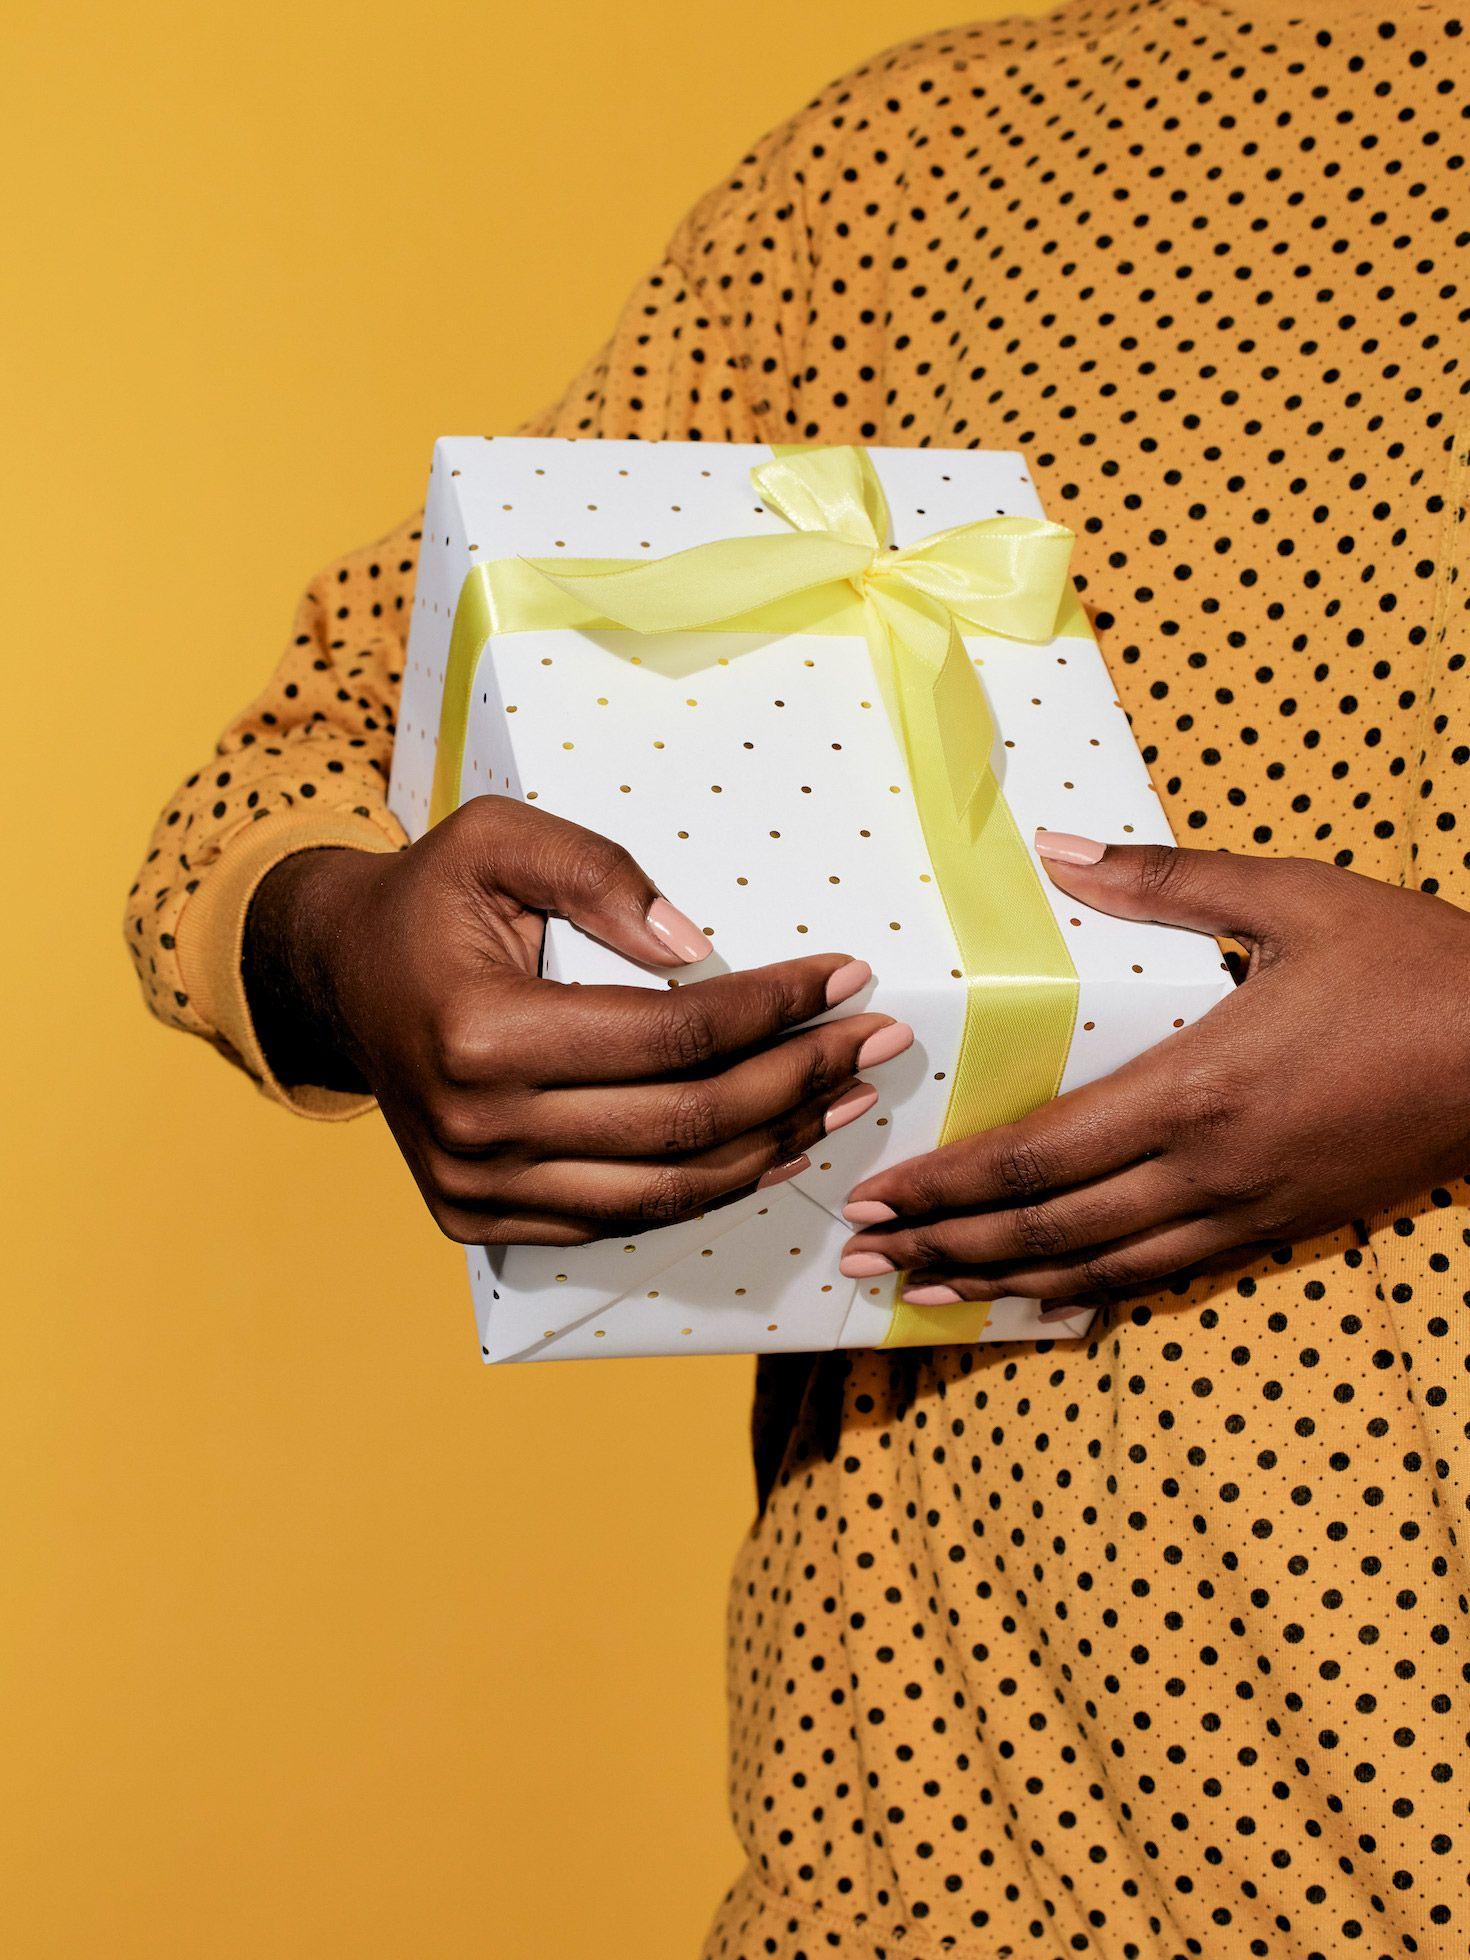 Wrap + Deliever